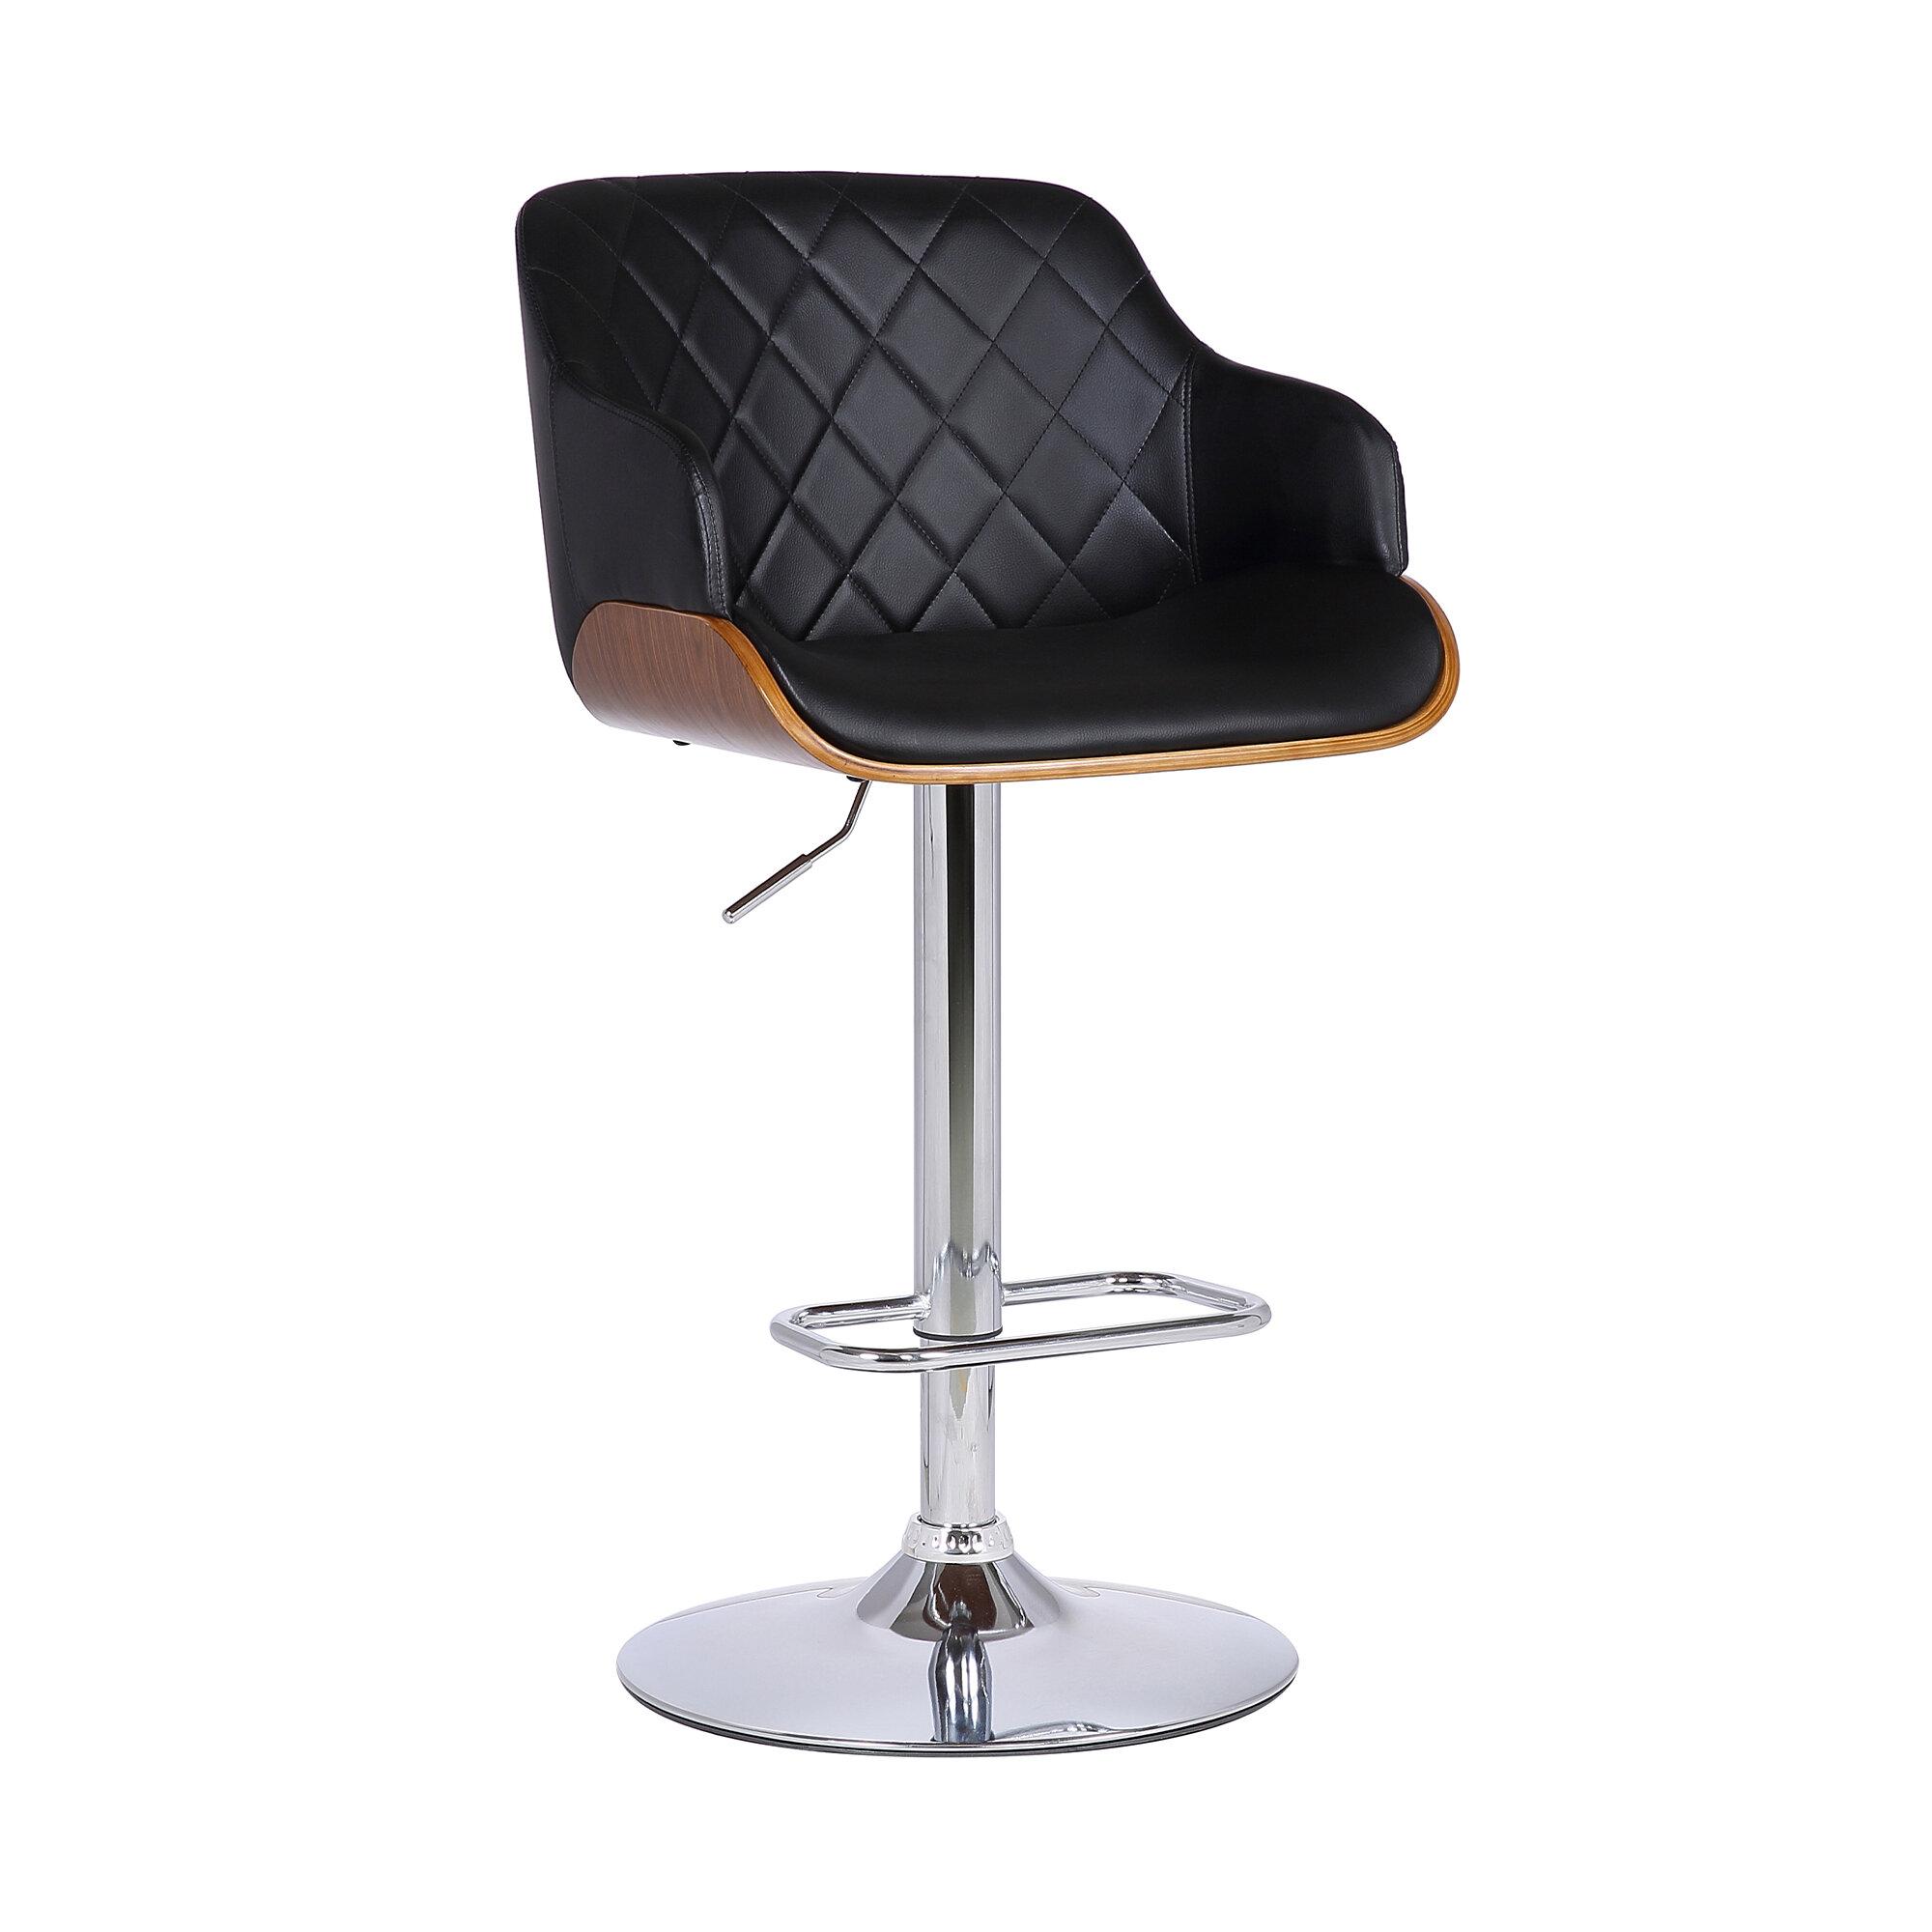 Fabulous Brayden Studio Jaxxon Adjustable Height Swivel Bar Stool Forskolin Free Trial Chair Design Images Forskolin Free Trialorg